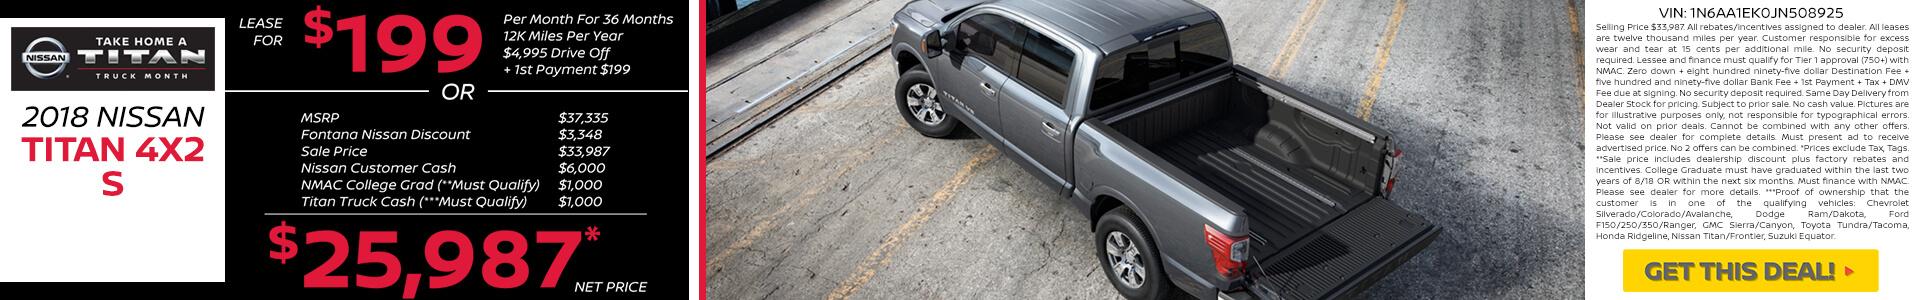 Nissan Titan $199 Lease $25,987 Purchase